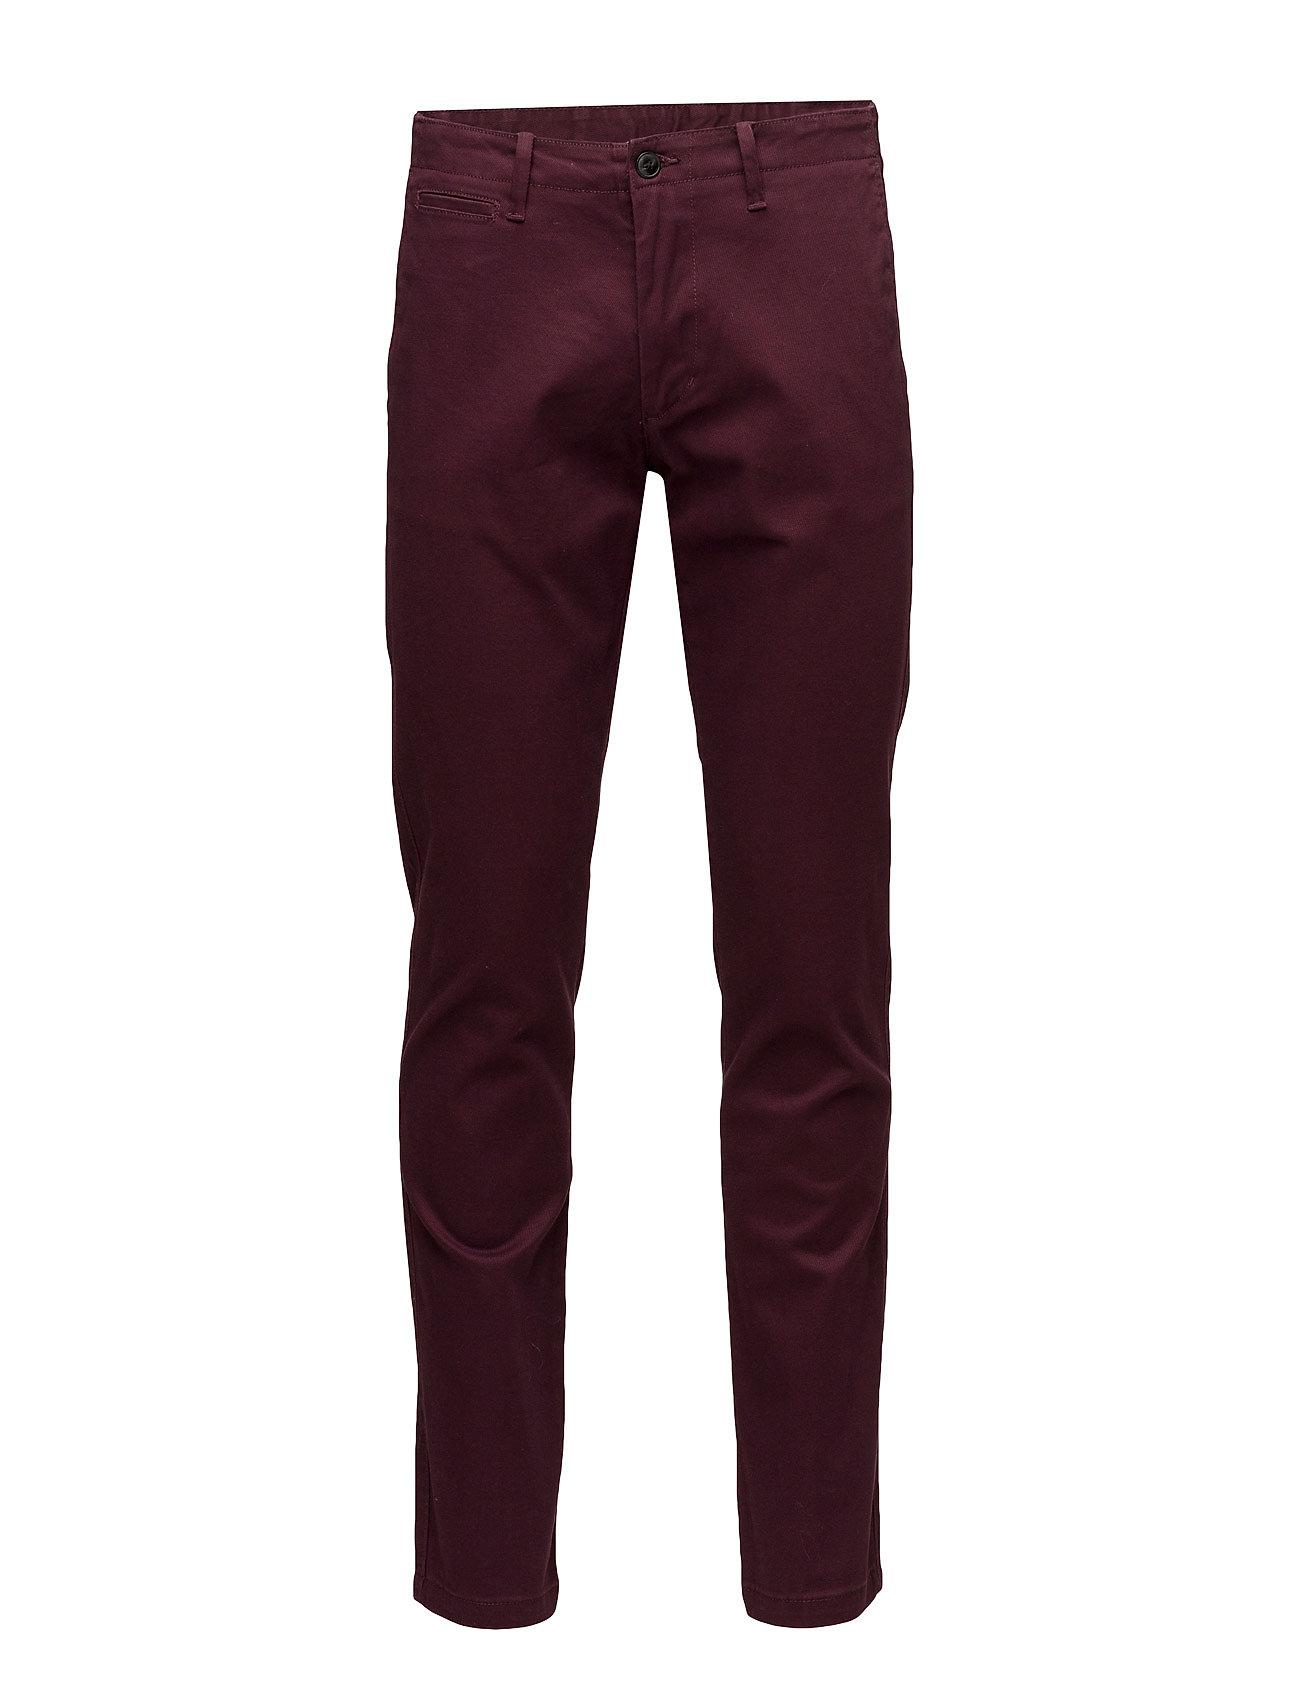 Trousers United Colors of Benetton Chinos til Herrer i 28Z